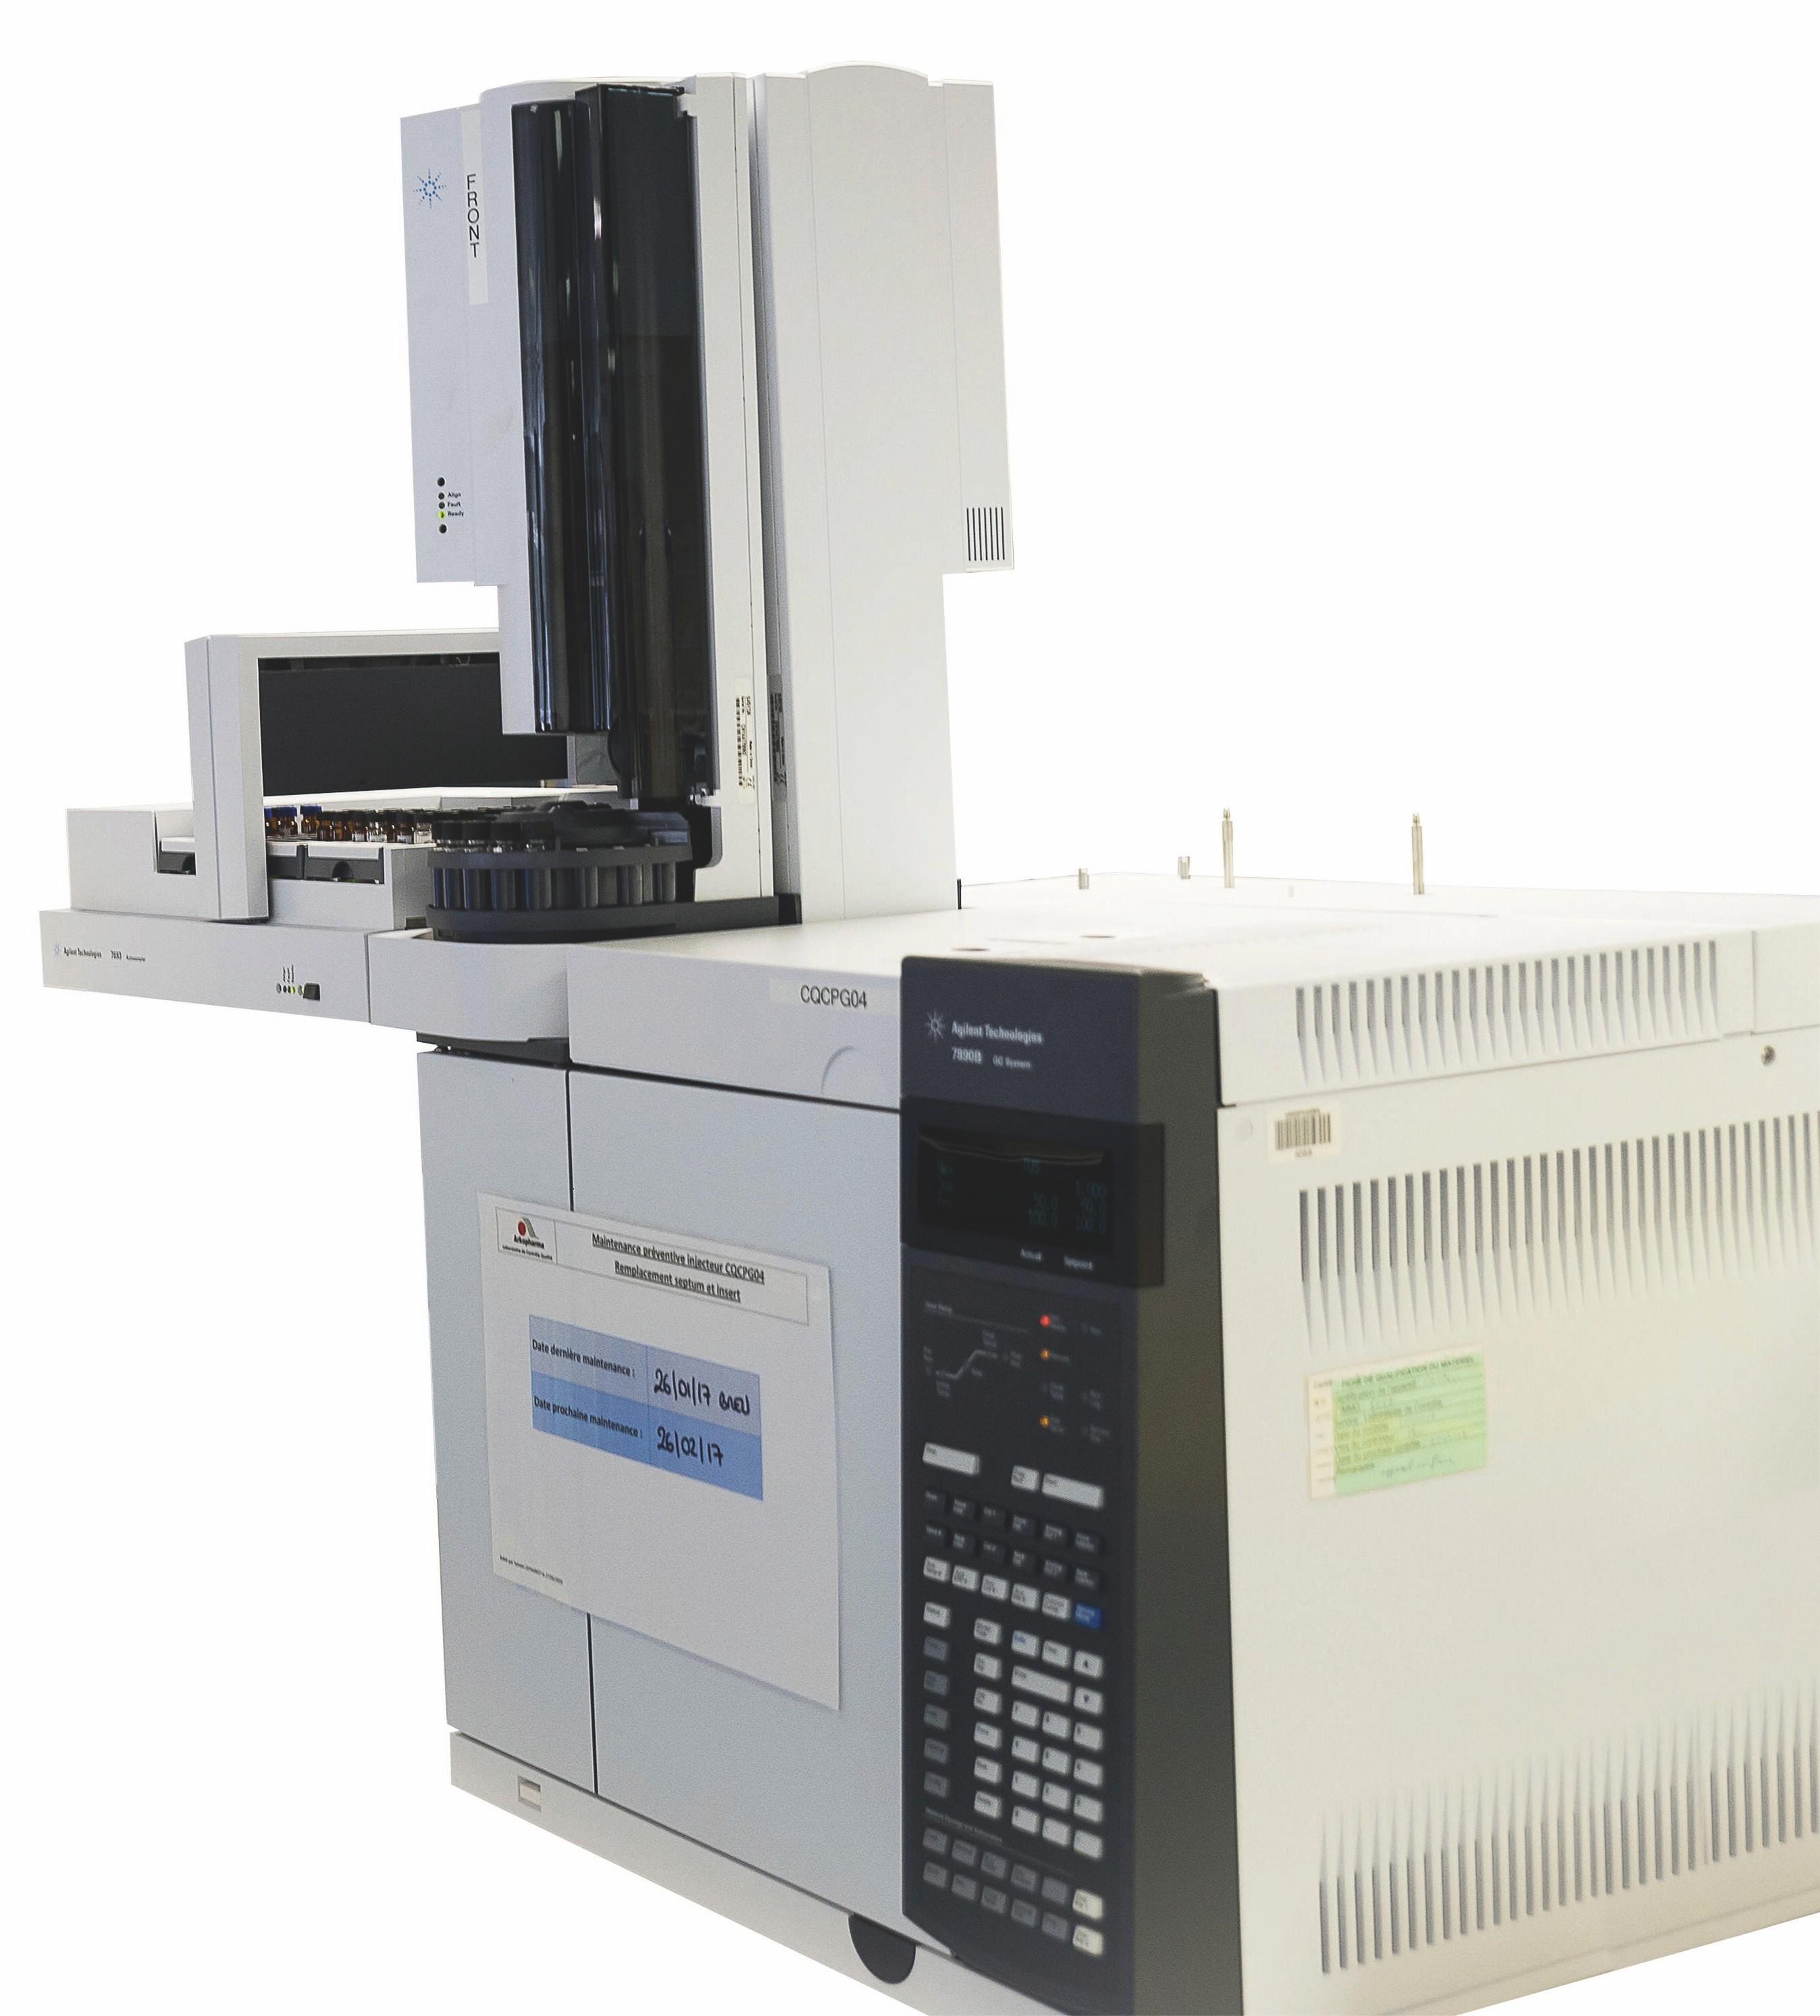 Appareil de chromatographie en phase gazeuse